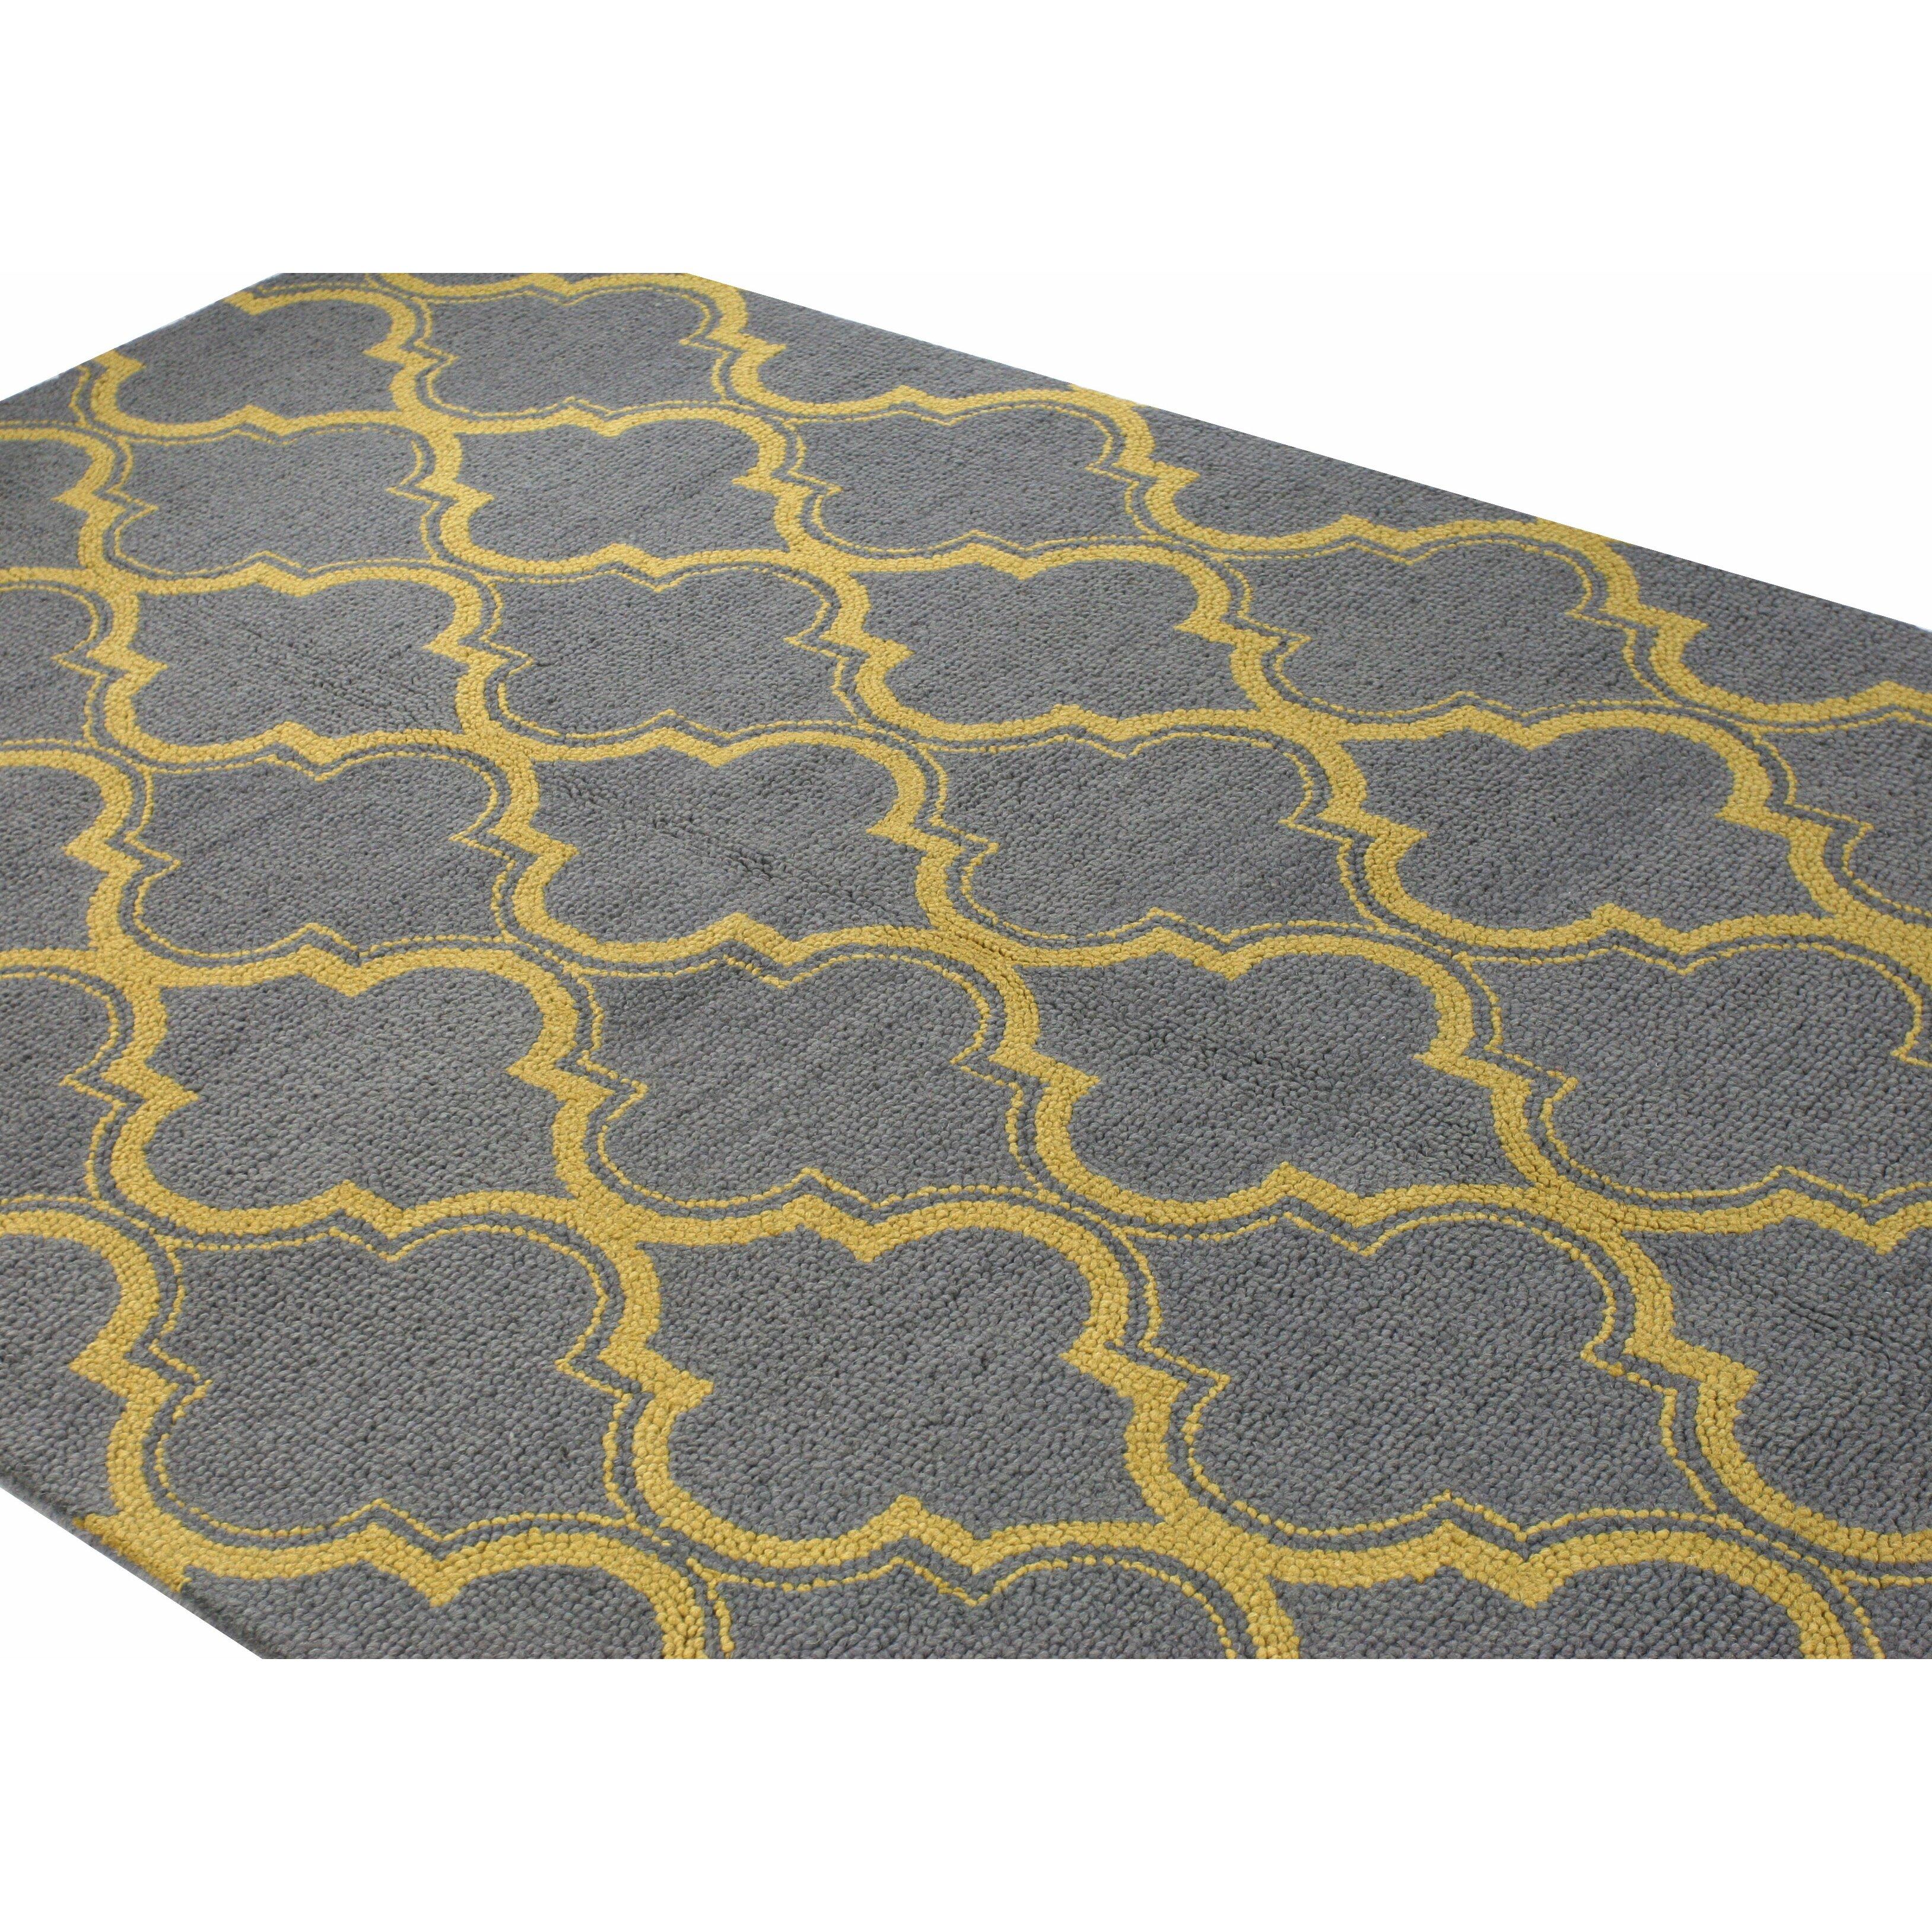 Bashian Rugs Rajapur Grey & Gold Area Rug & Reviews